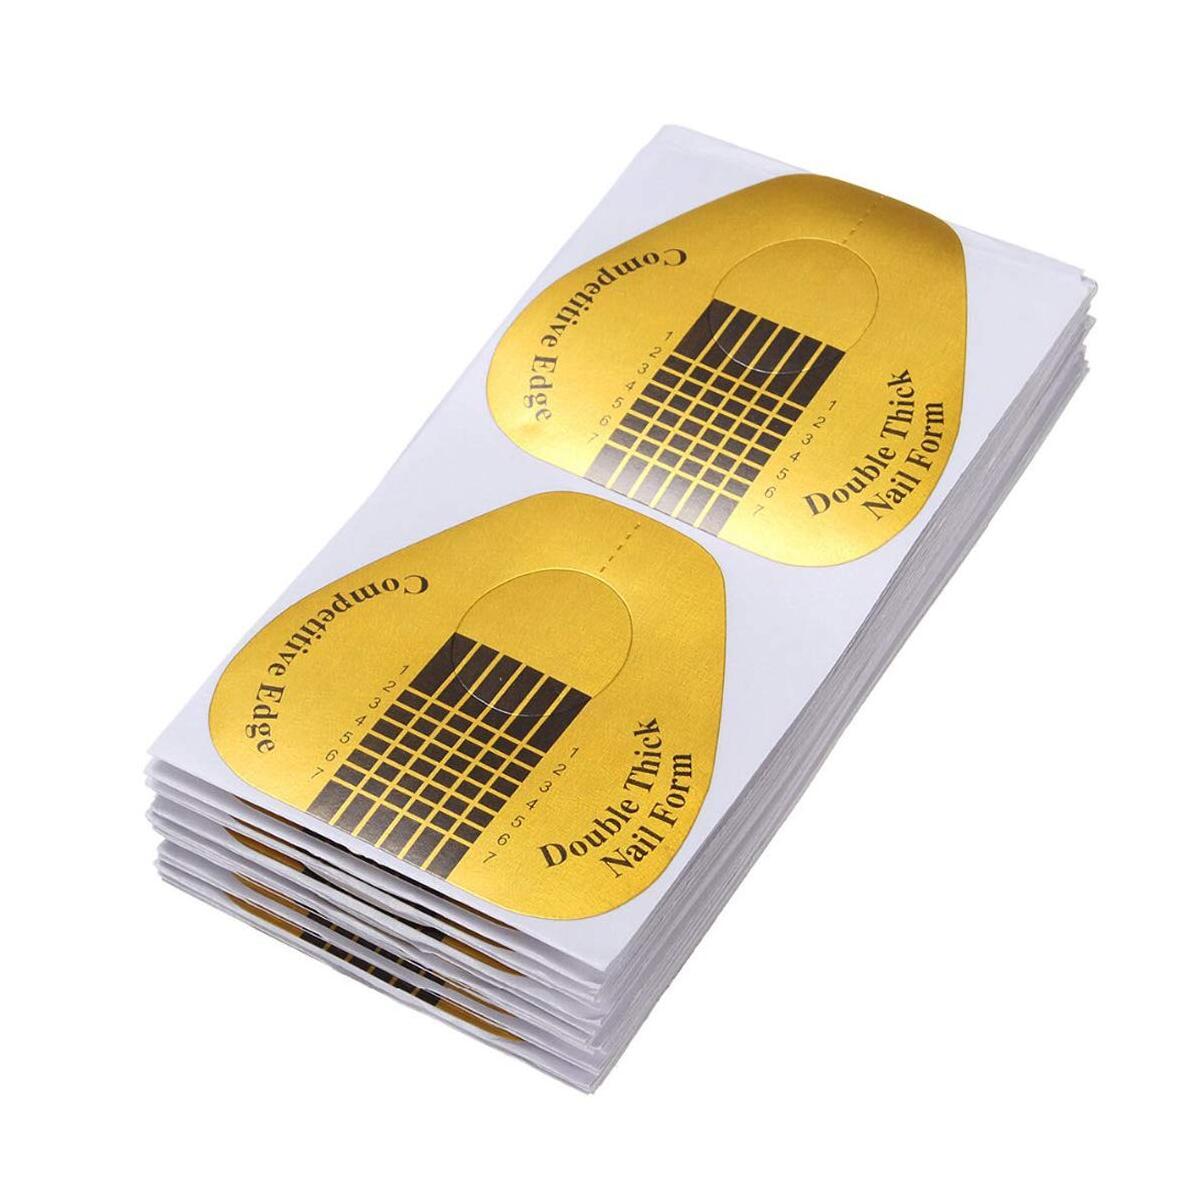 120 Pcs Acrylic Nail Forms Horseshoe-shaped Nail Art Acrylic Nail/UV GEL Nail Extention Tips Form Guide Sticker